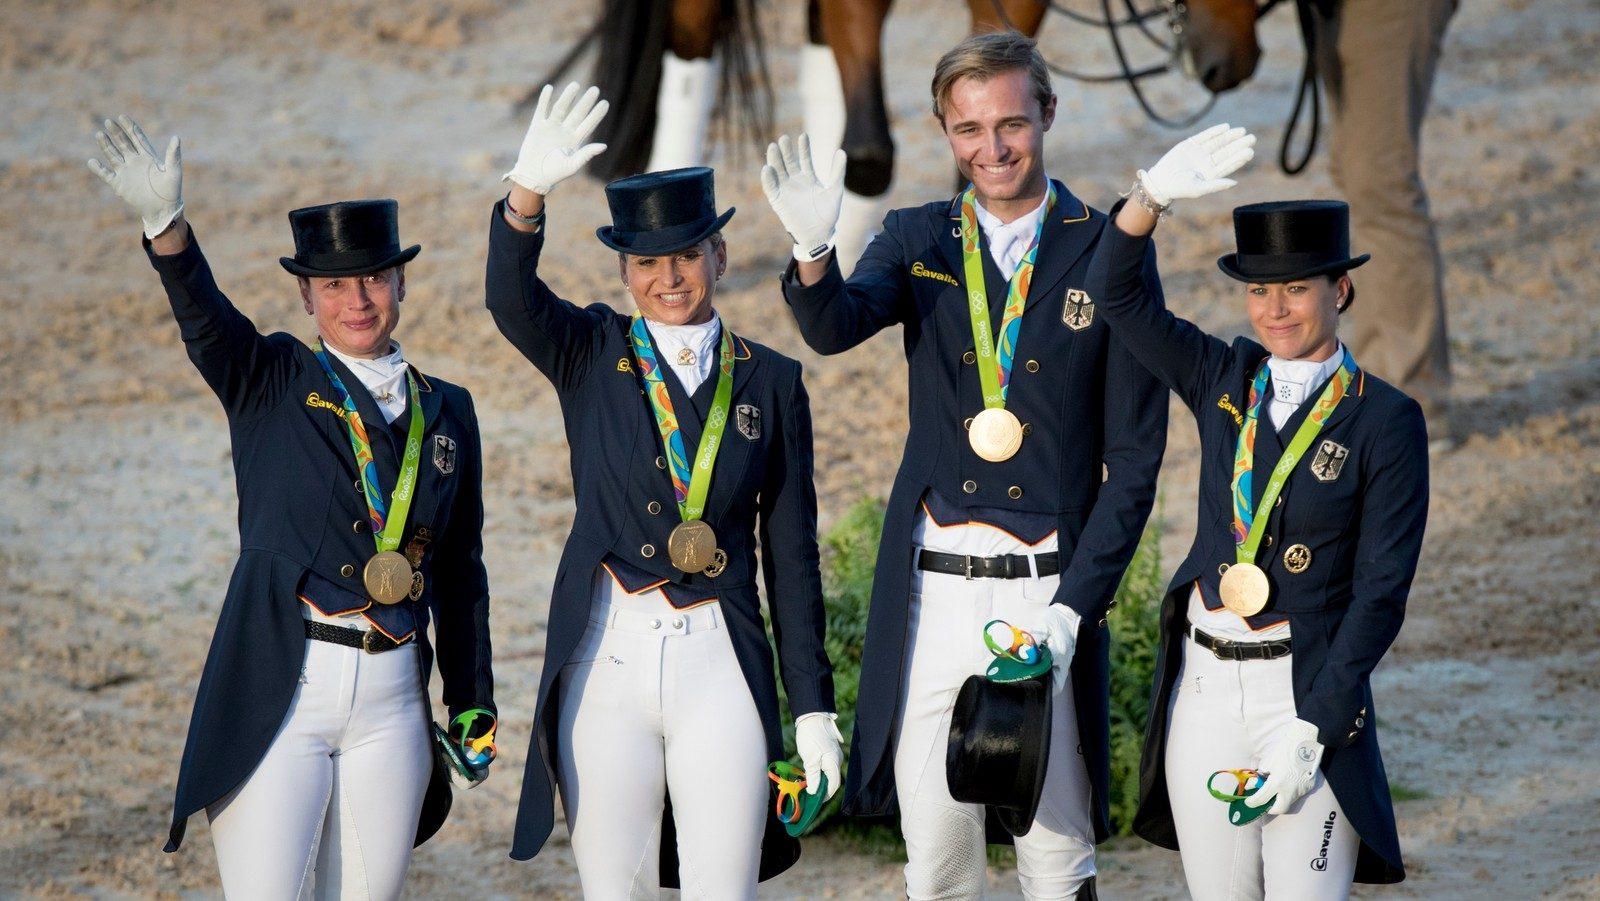 Het gouden Duitse dressuurteam, bestaande uit Isabell Werth, Dorothee Schneider, Sönke Rothenberger en Kristina Bröring-Sprehe. Foto FEI | Dirk Caremans